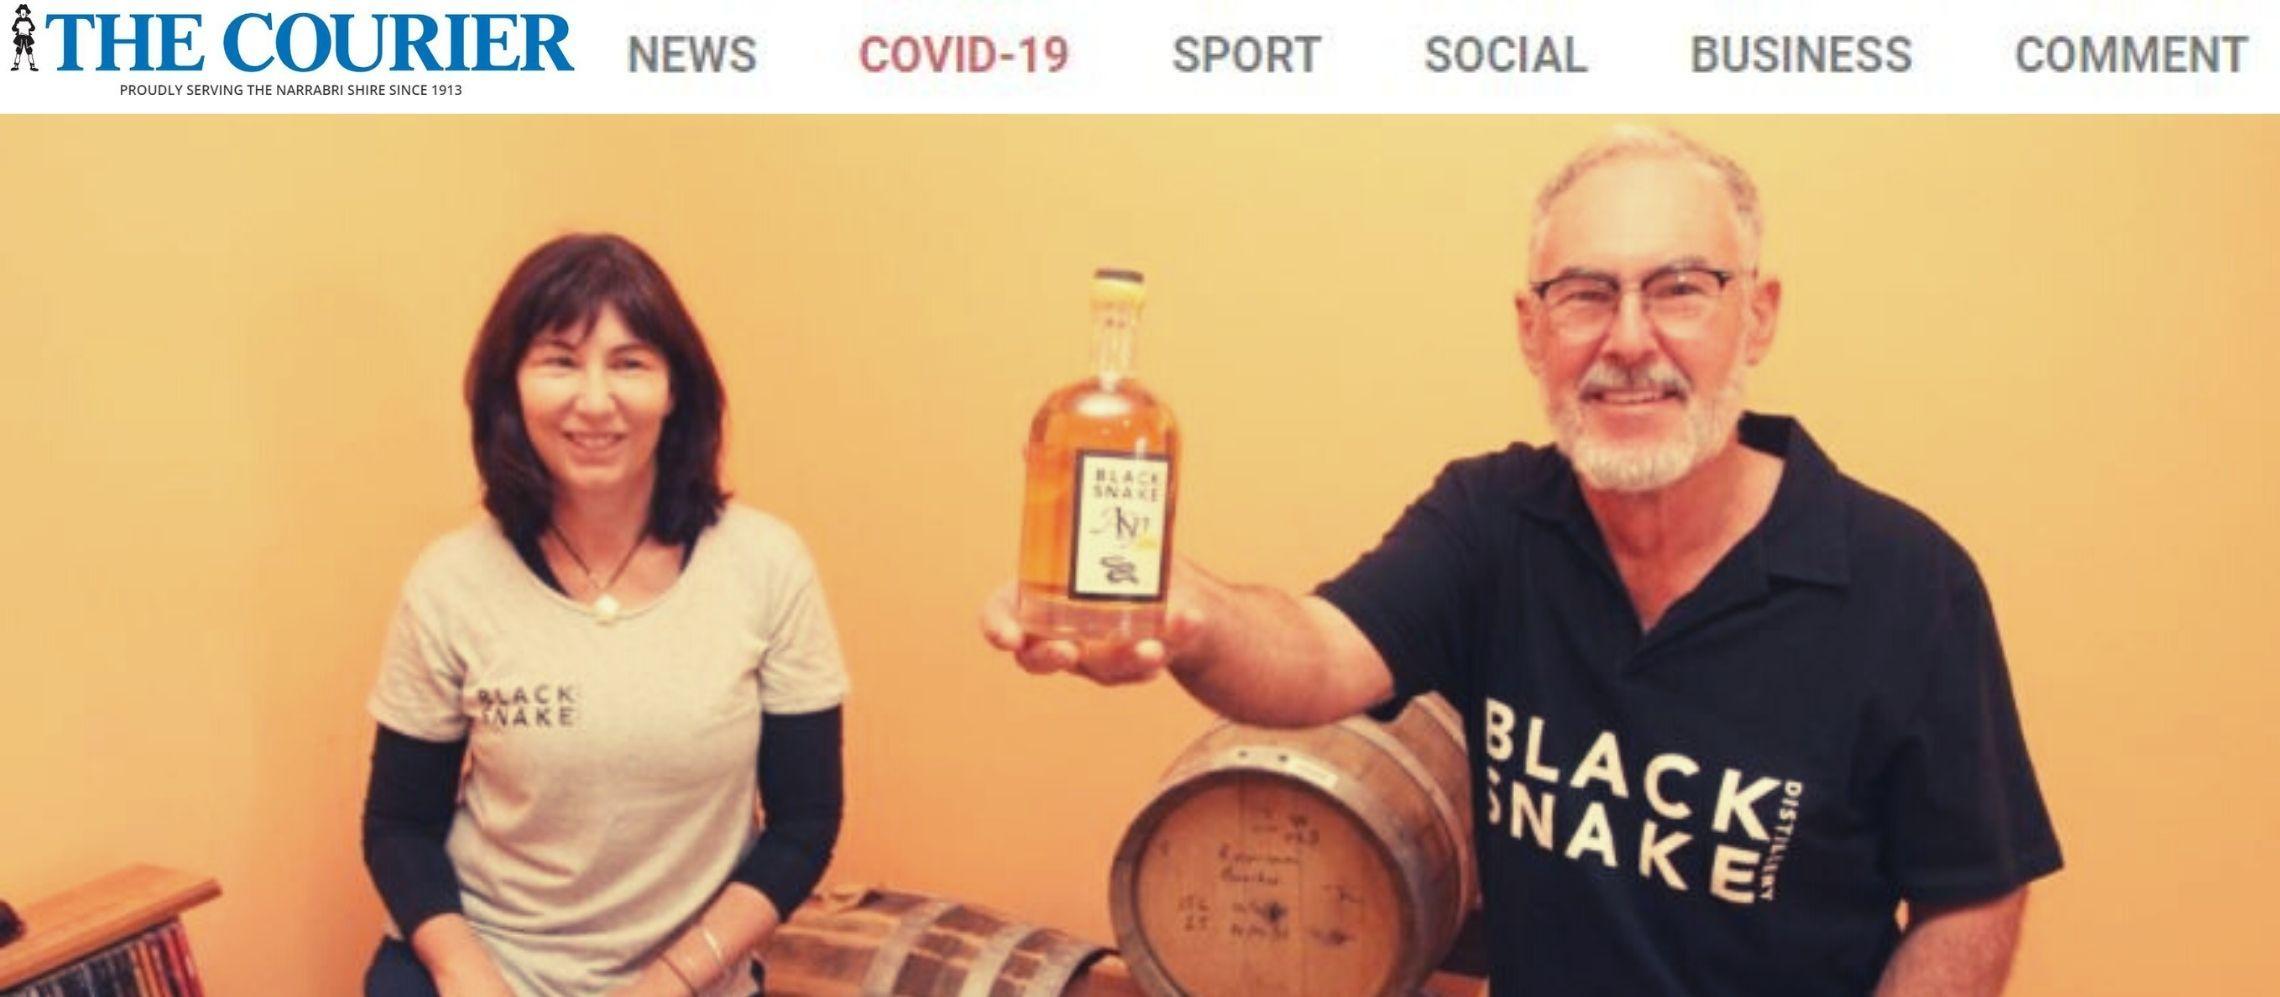 Photo for: Narrabri distillers win silver medal at London Spirits Competition 2021 Via Narrabri Courier PR